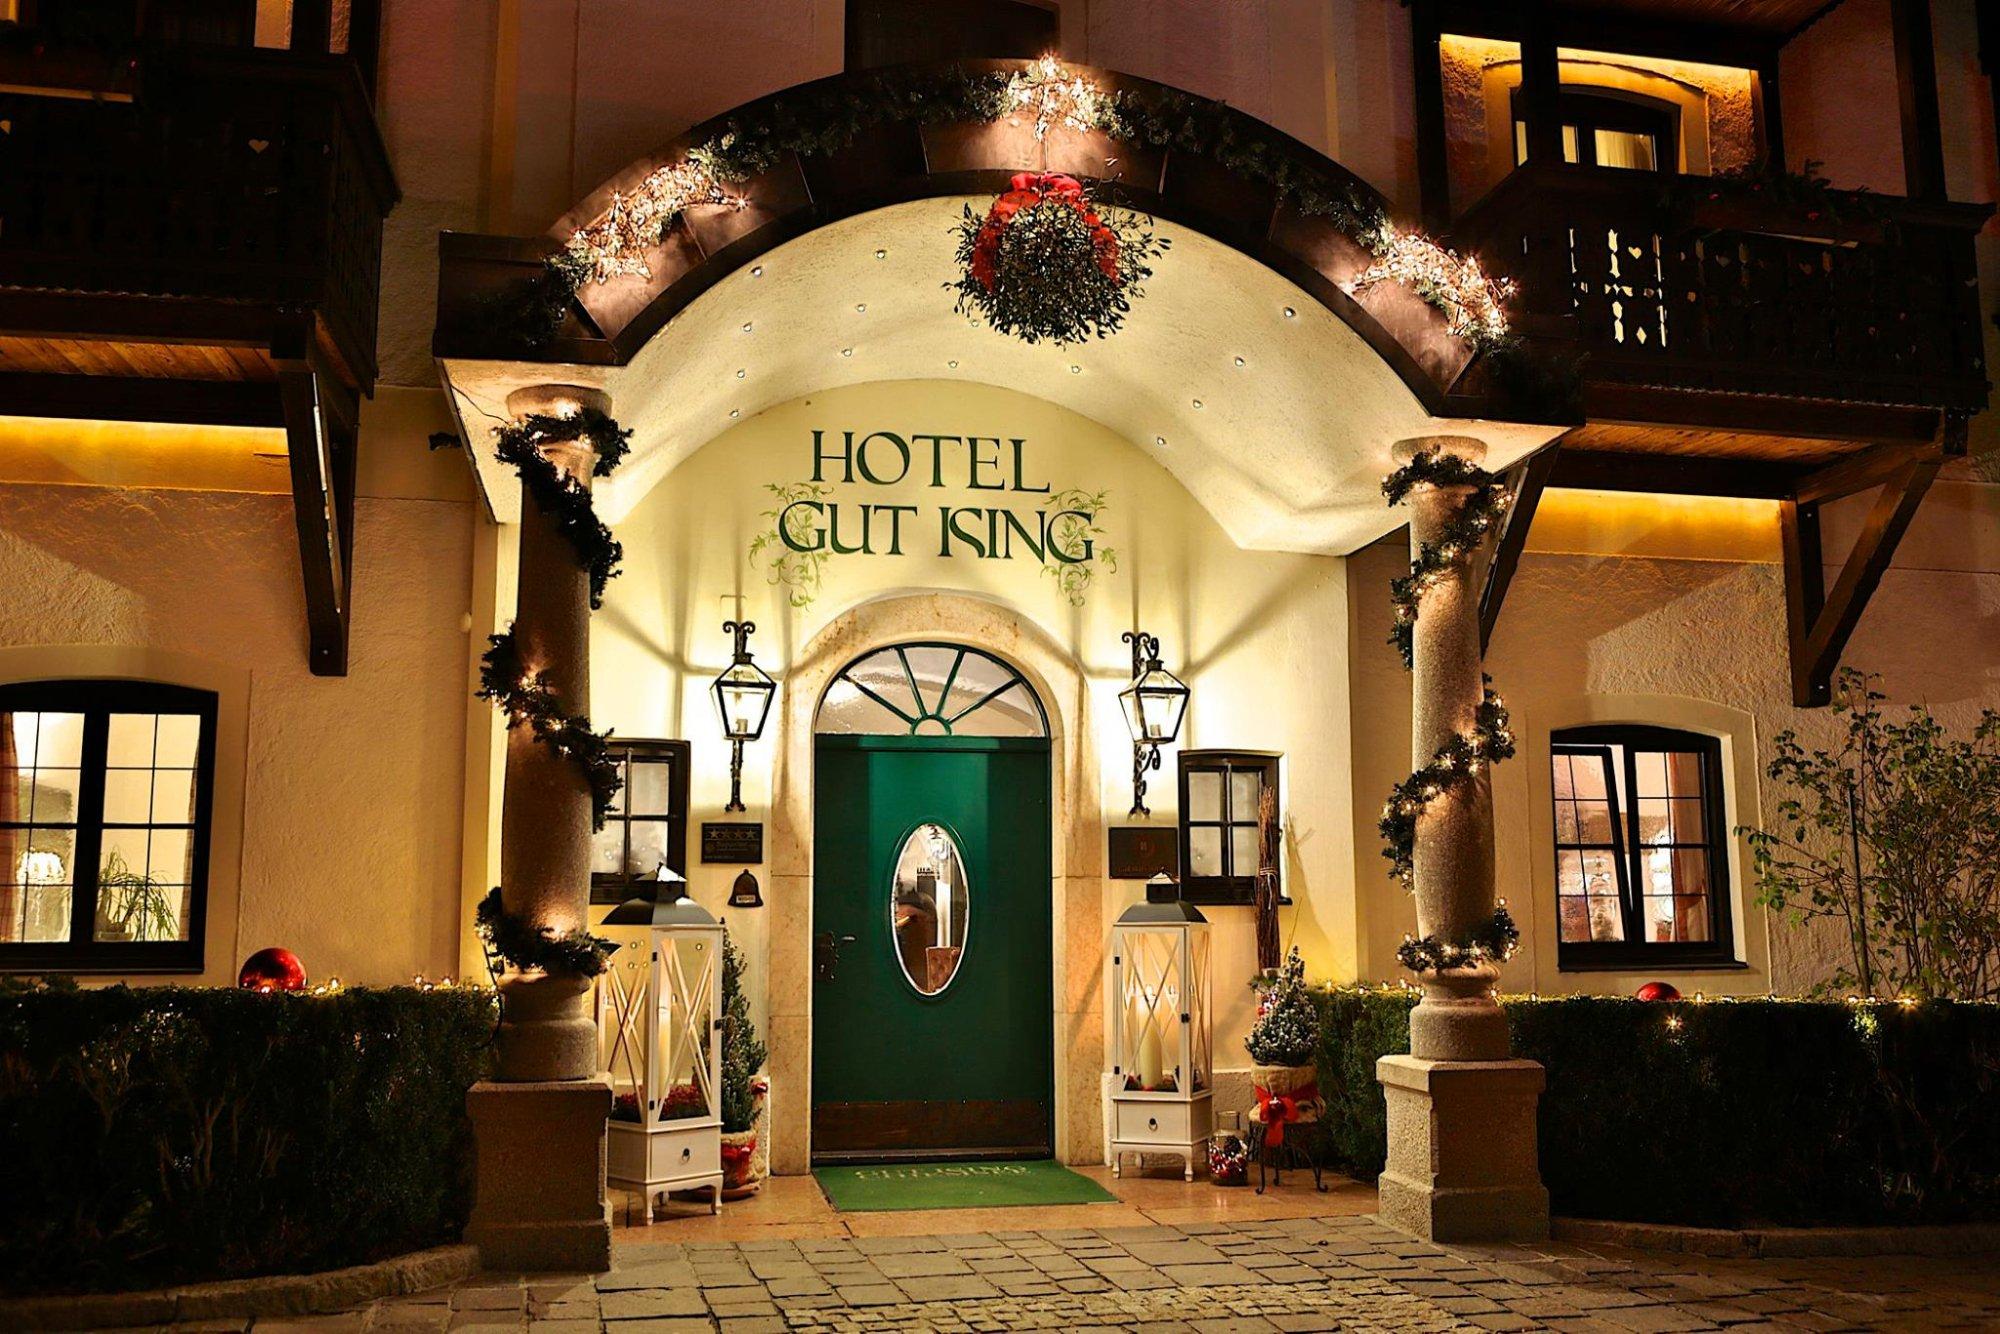 Hotel Gut Ising